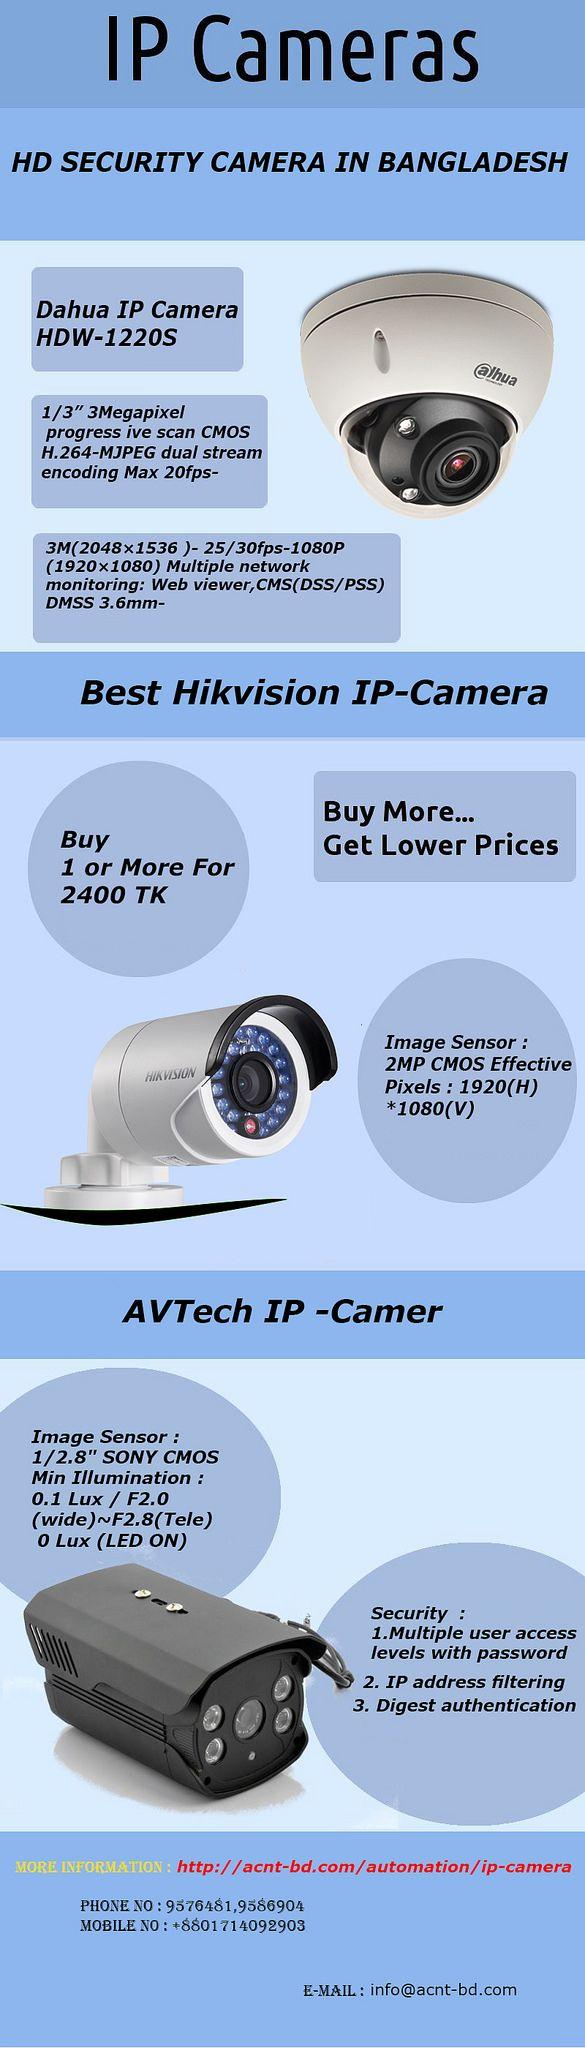 https://flic.kr/p/T9f9ya | Latest IP Camera Price in Bangladesh at acnt-bd.com | Acnt-bd.com is providing the best ip camera price in Bangladesh offering dahua, jovision ip camera in Dhaka, Bangladesh.